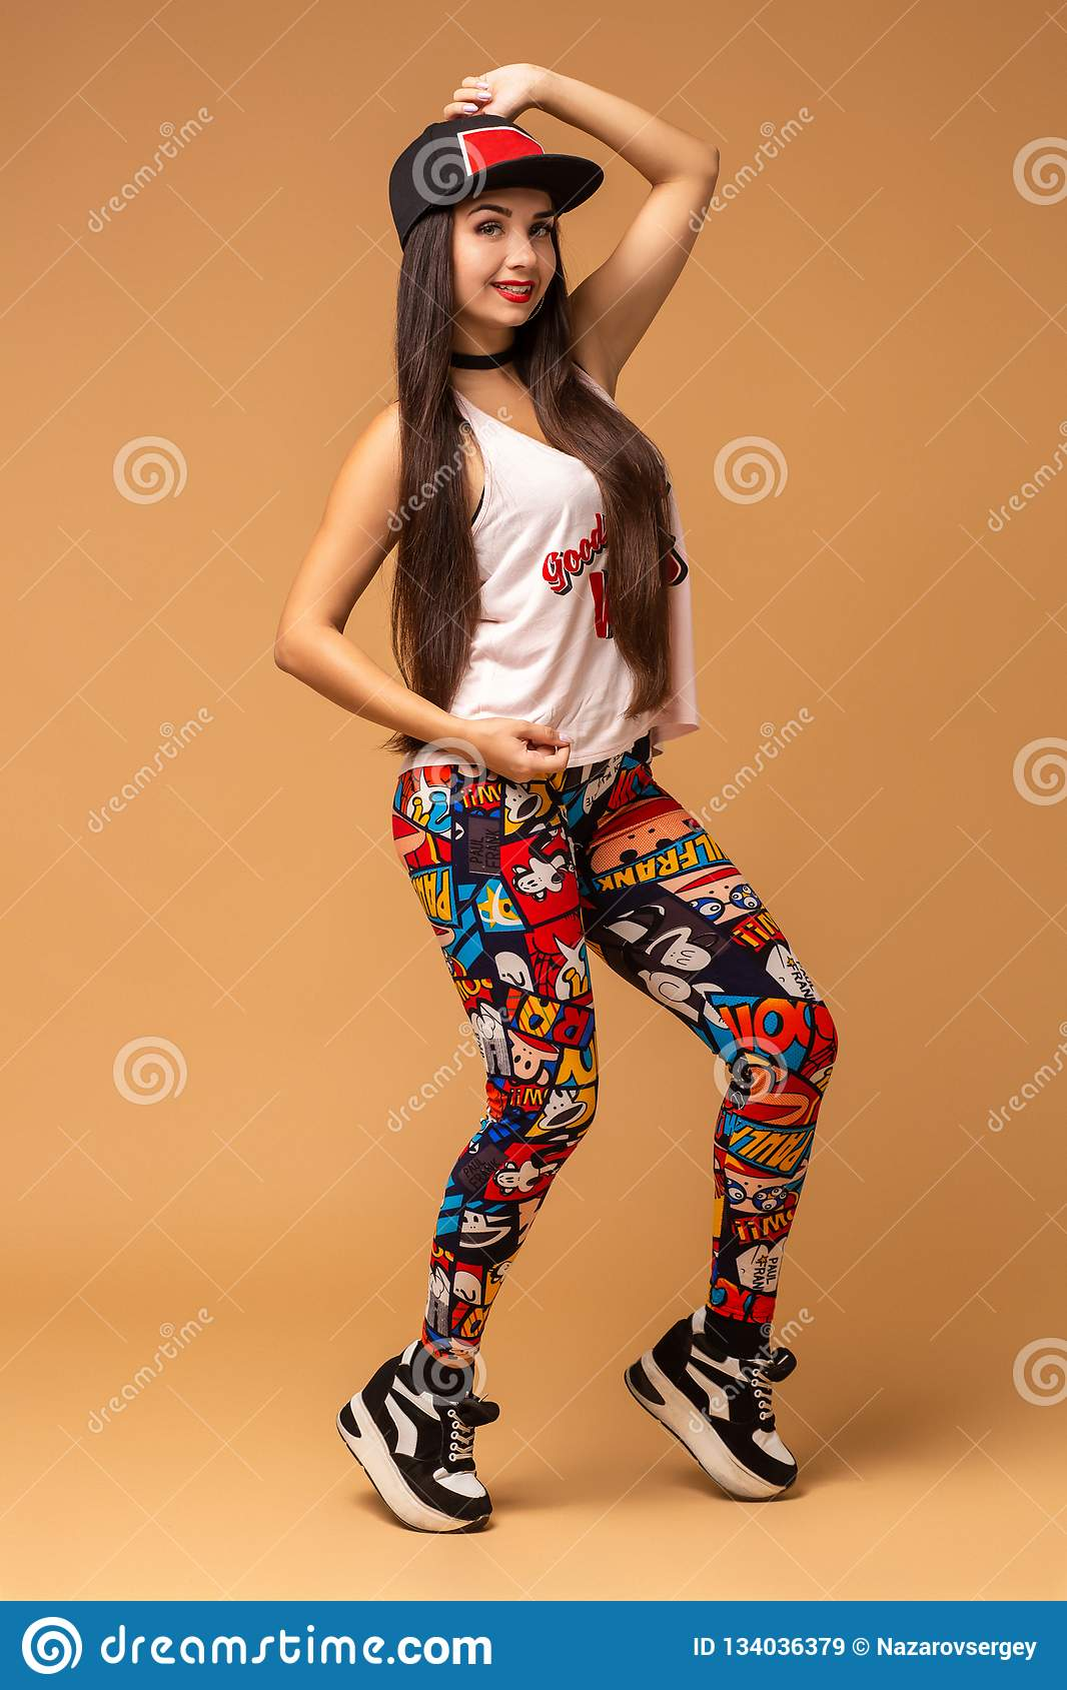 Modern style dancer posing on studio background. Hip hop, jazz funk, dancehall